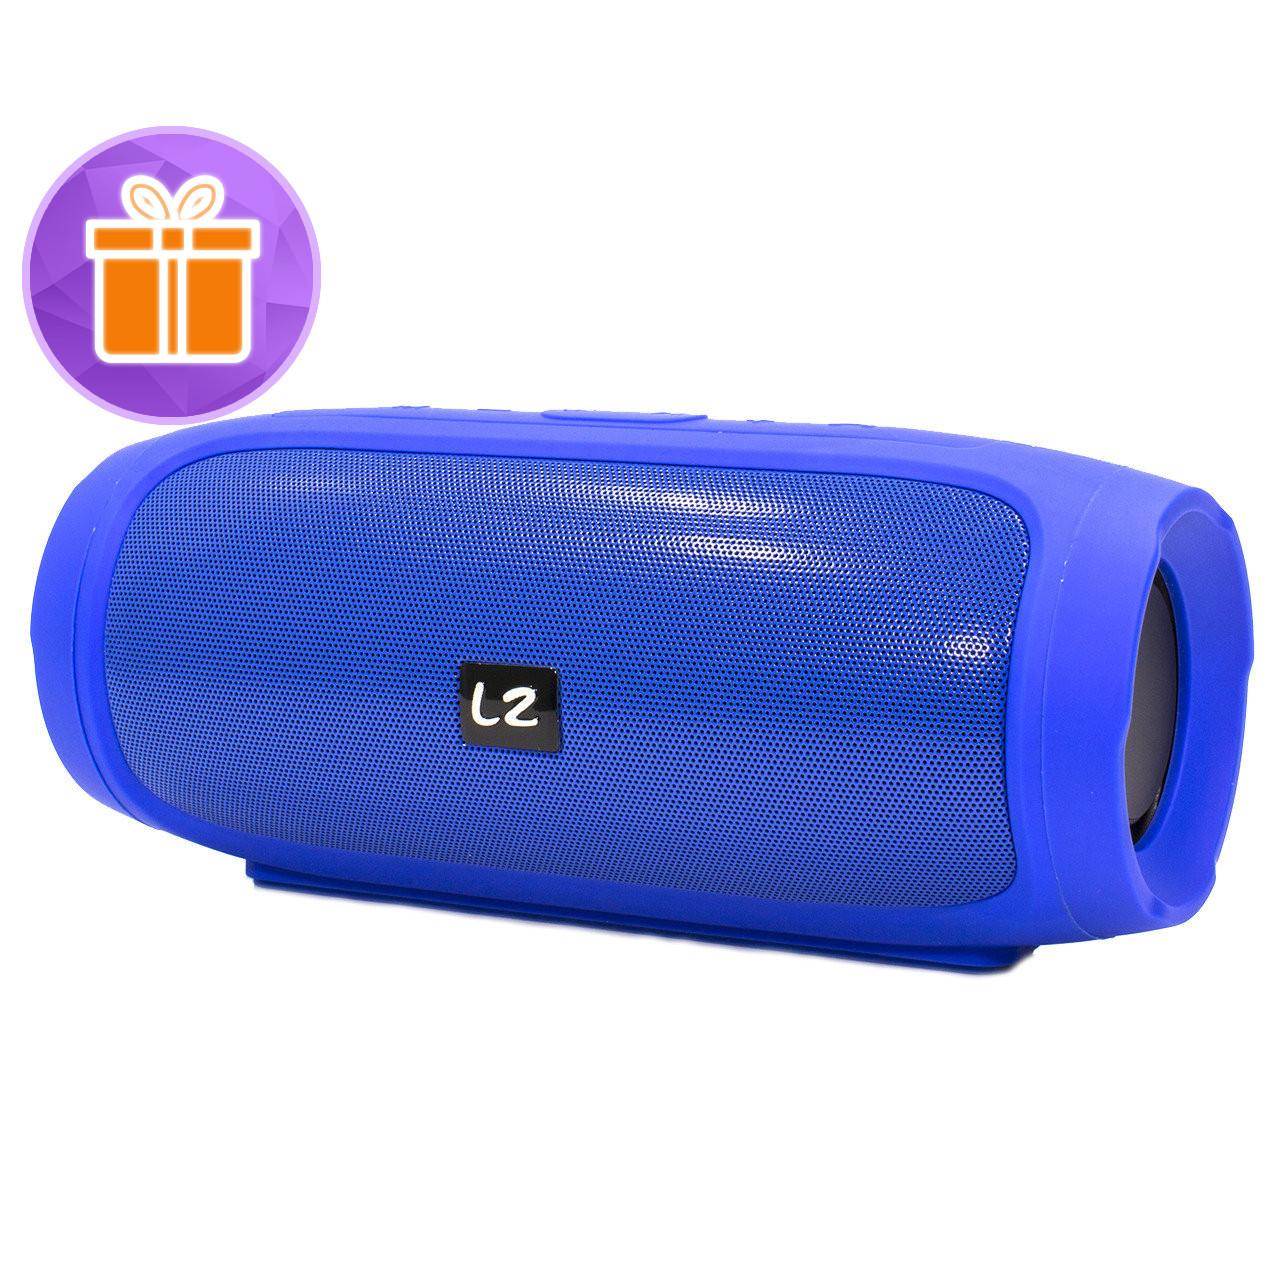 ✕Переносная колонка LZ Charge 4 Blue компактная акустика для дома музыки функция Bluetooth Power bank